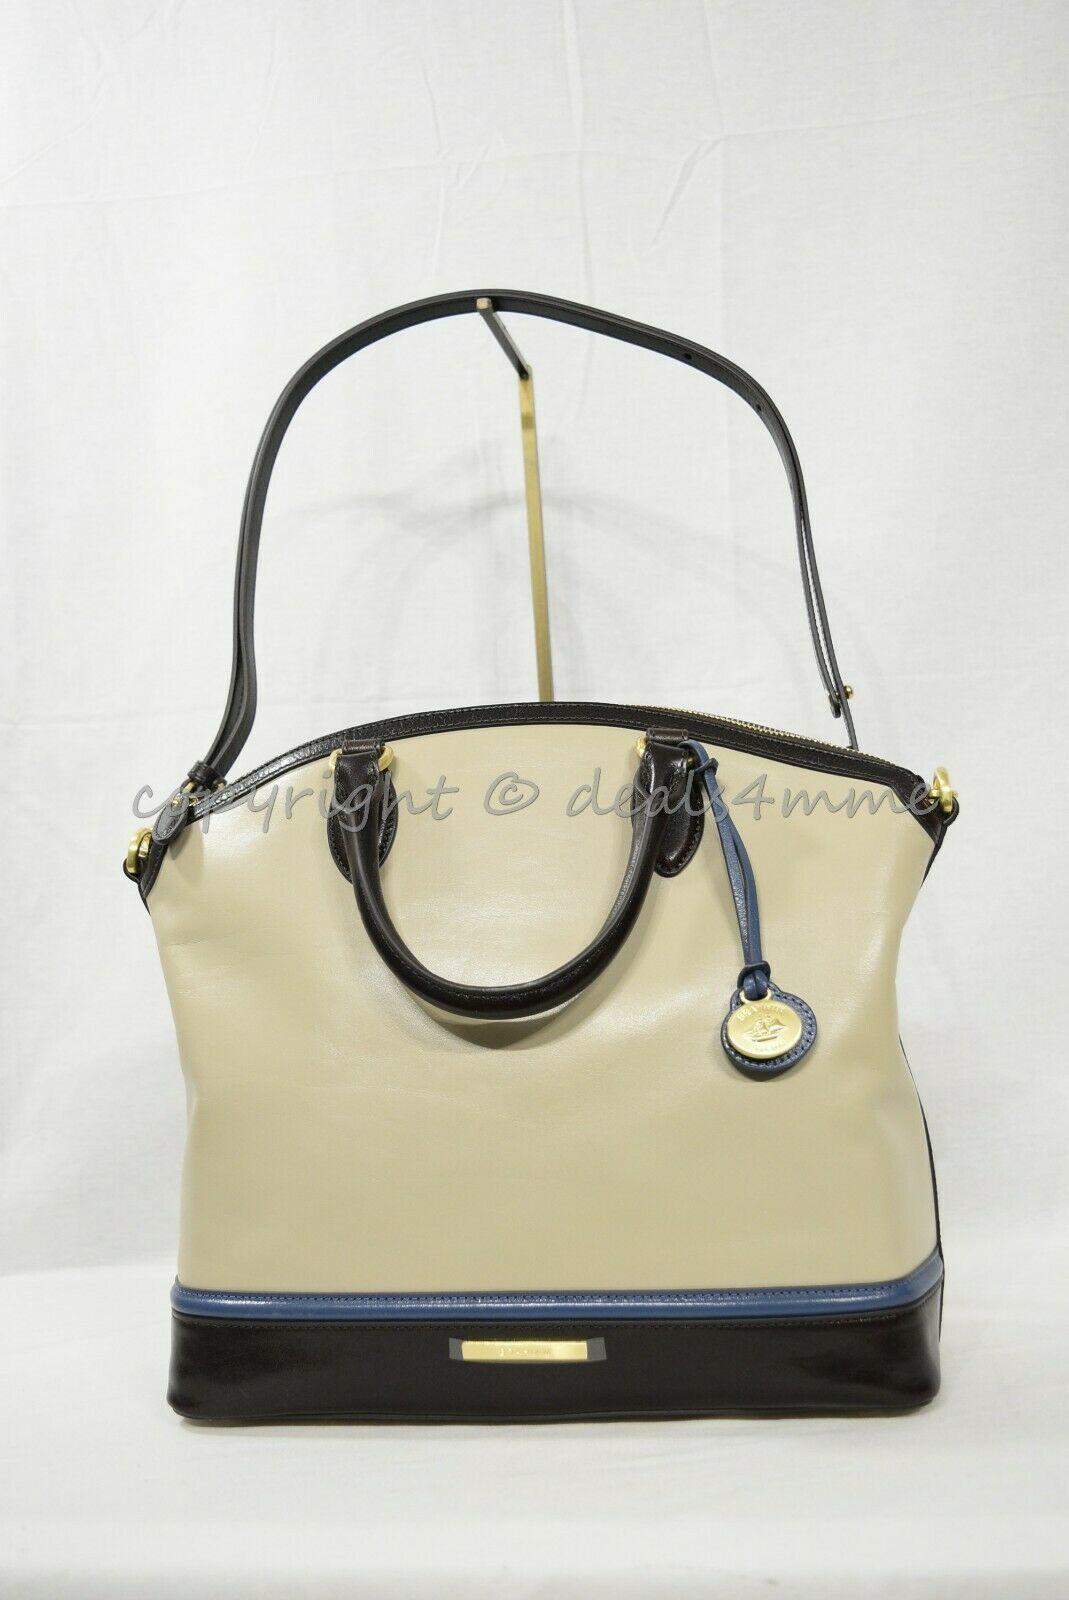 NWT Brahmin Large Duxbury Smooth Leather Satchel/Shoulder Bag in Sand Westport image 2